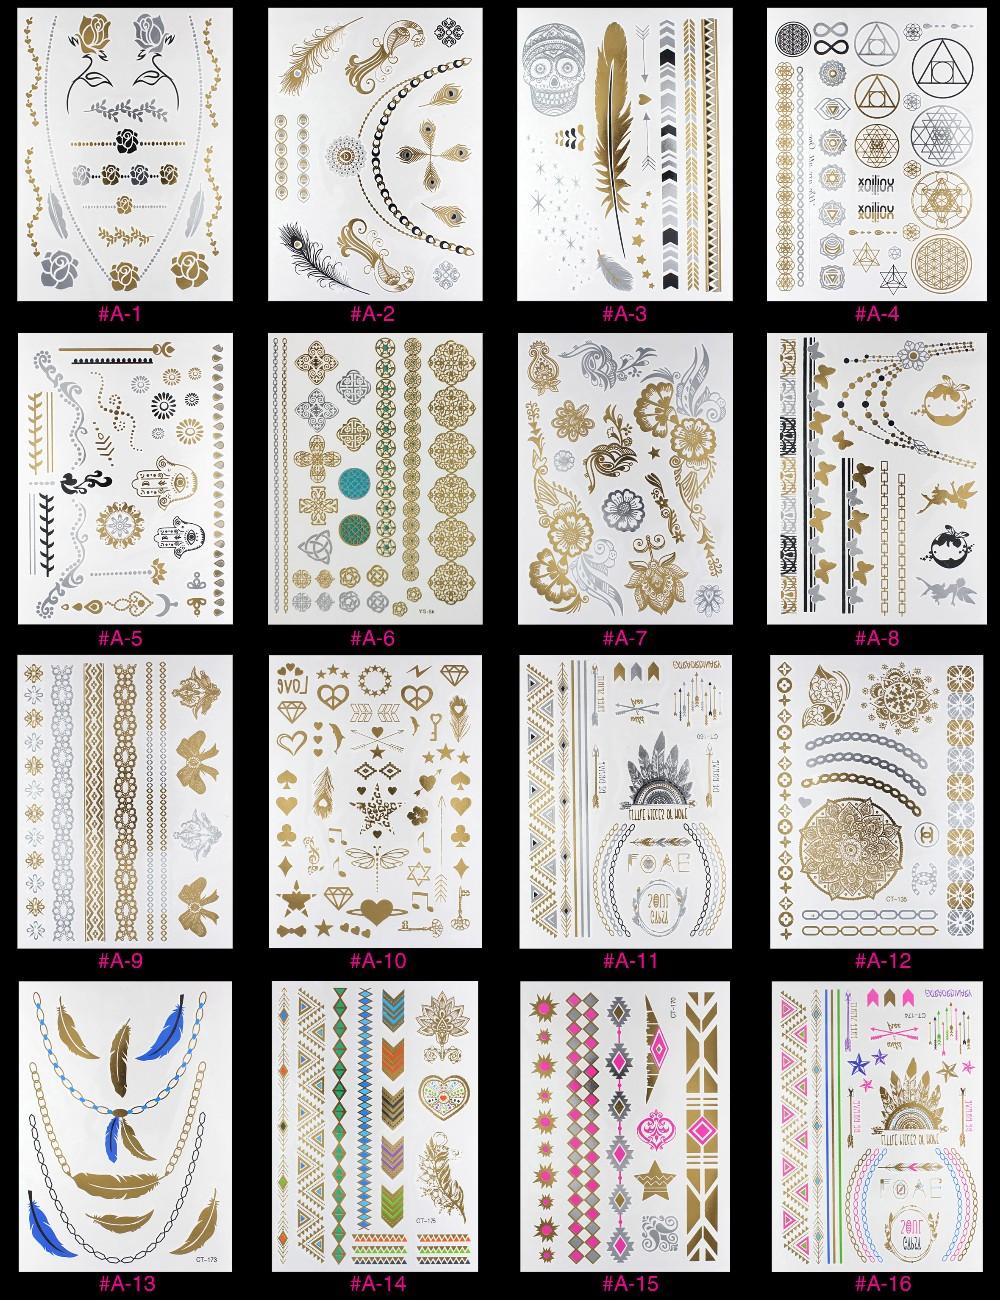 New Design Flash Removable Waterproof Gold Tattoos Metallic Temporary Tattoo Stickers Temporary Body Art Tattoo 12